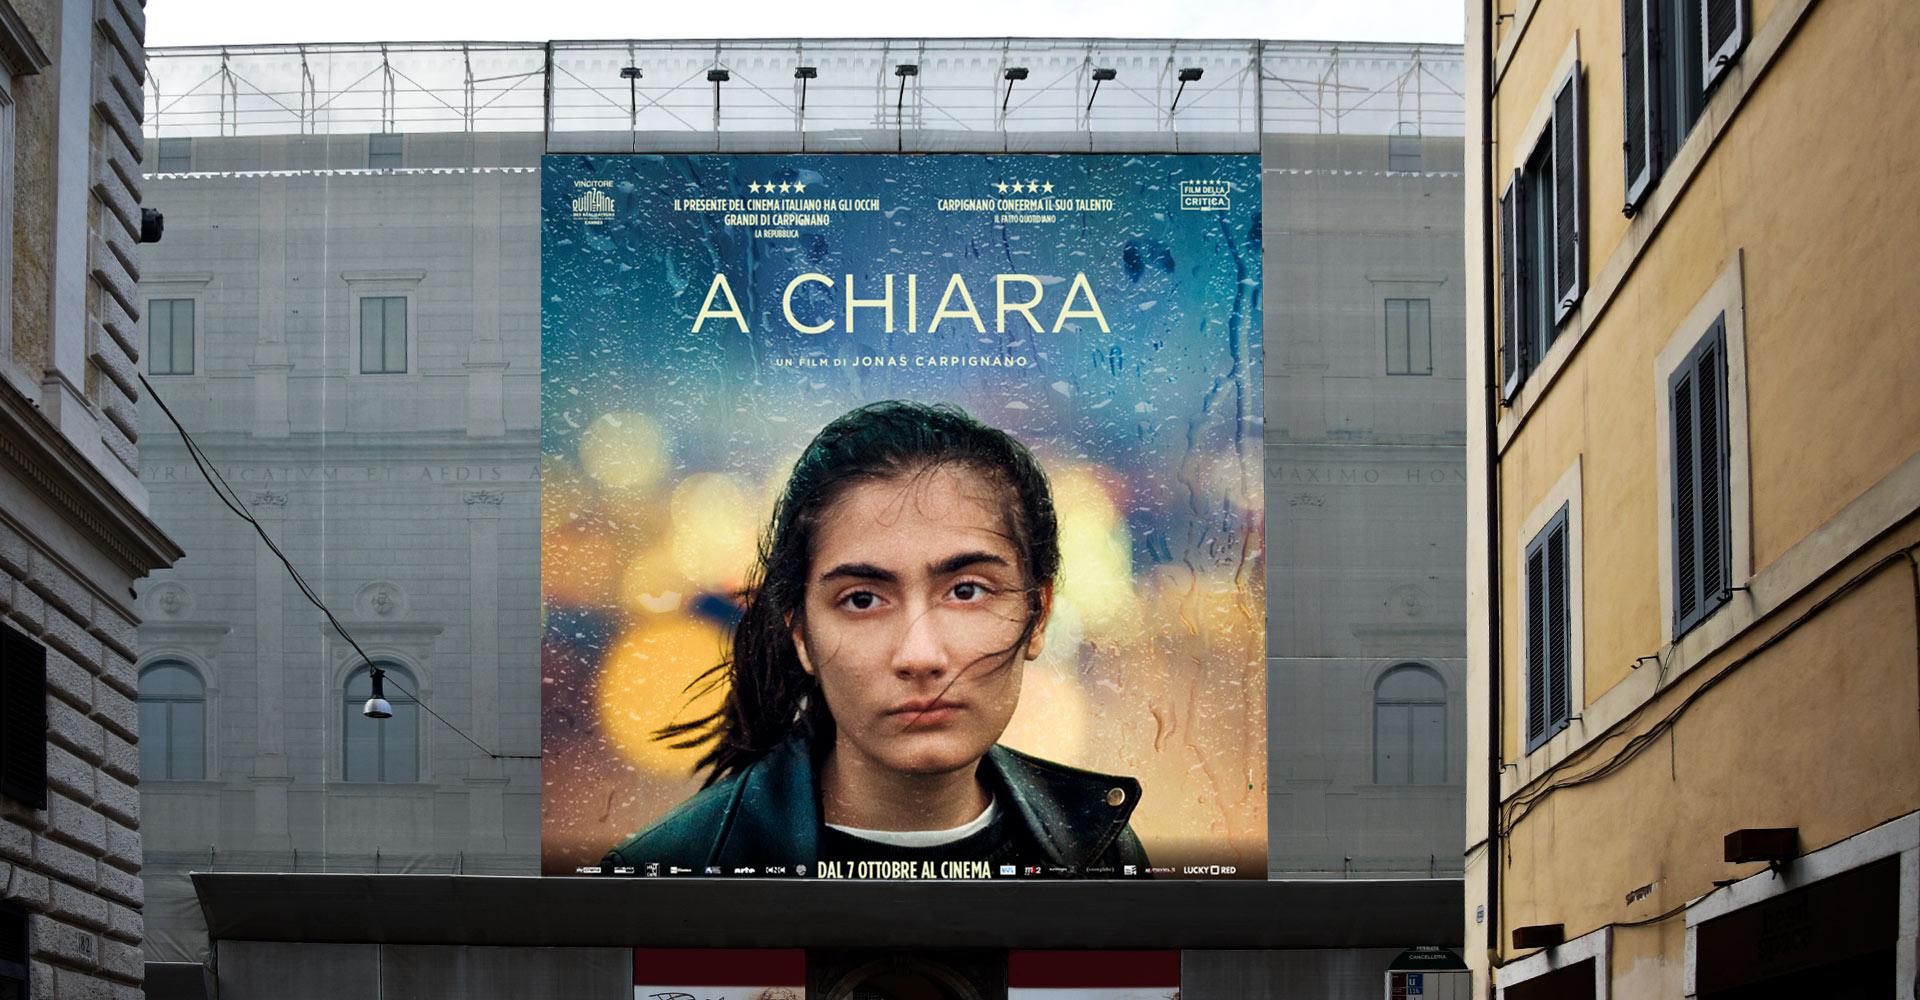 AChiara_Behance_04